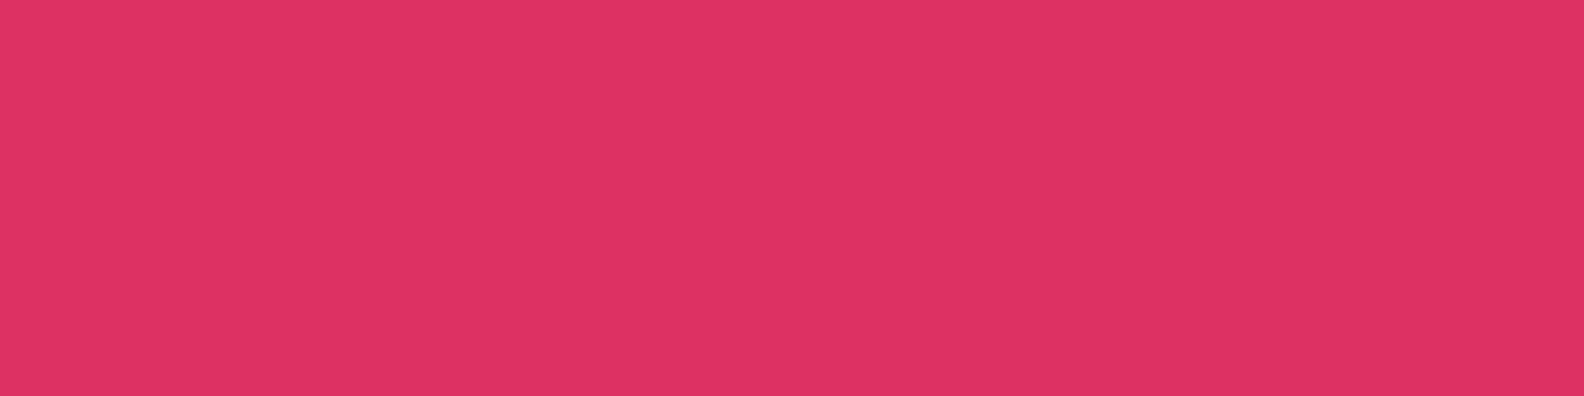 1584x396 Cerise Solid Color Background